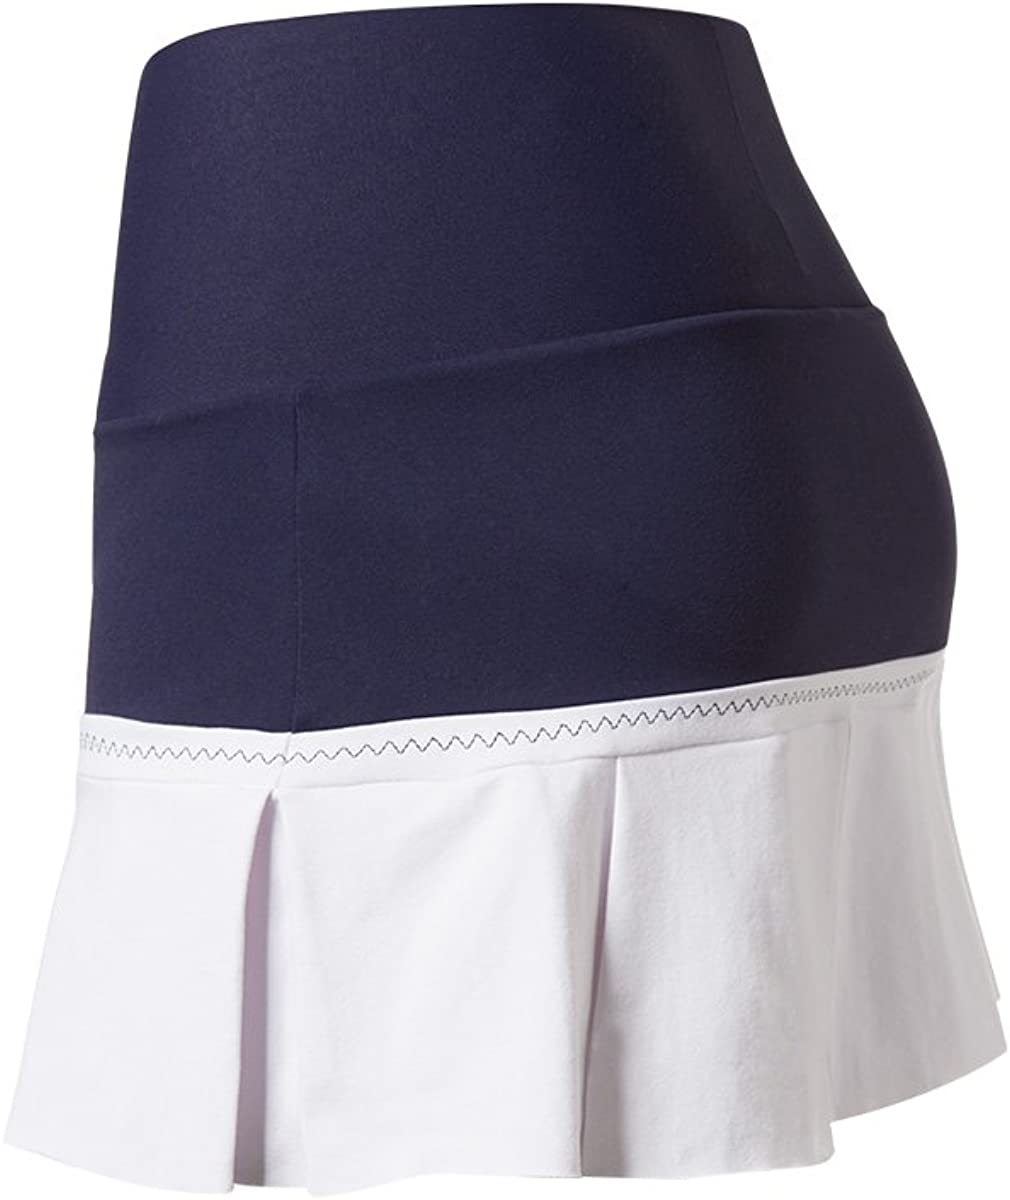 Naffta Tenis Padel - Falda-Short para Mujer, Color Marino/Blanco ...